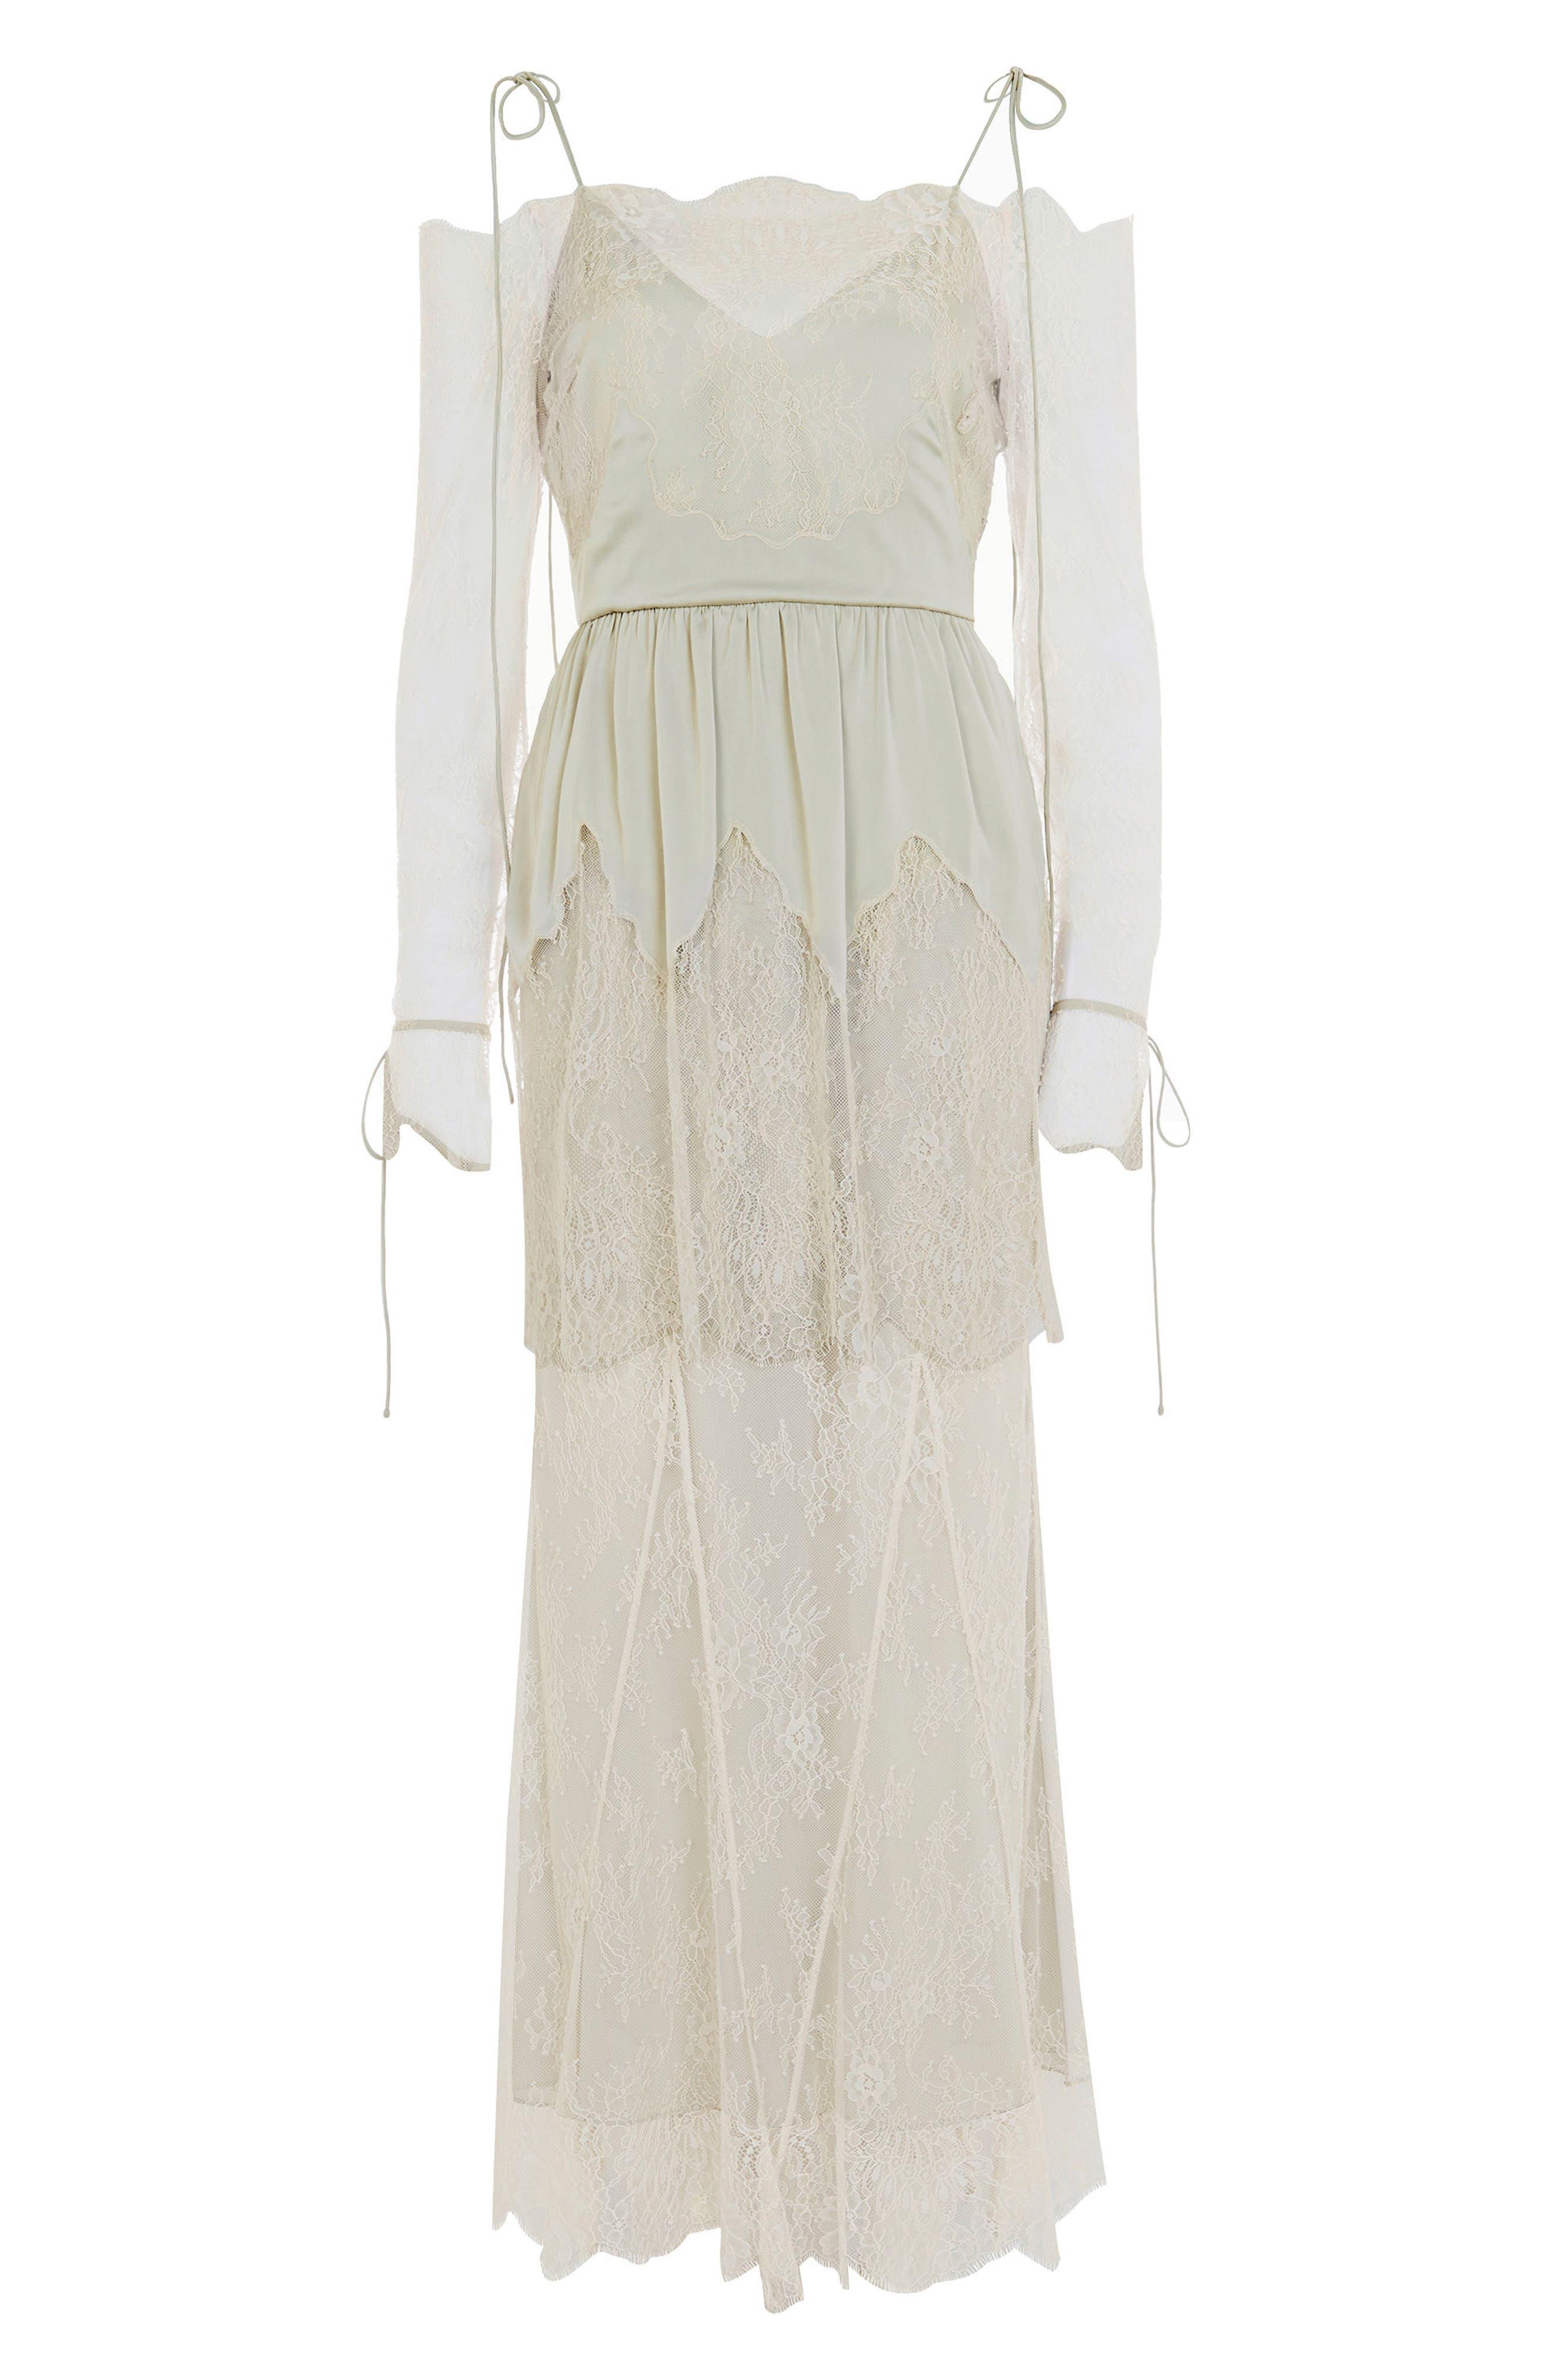 Bride Bardot Lace Off the Shoulder Gown,                             Alternate thumbnail 4, color,                             900